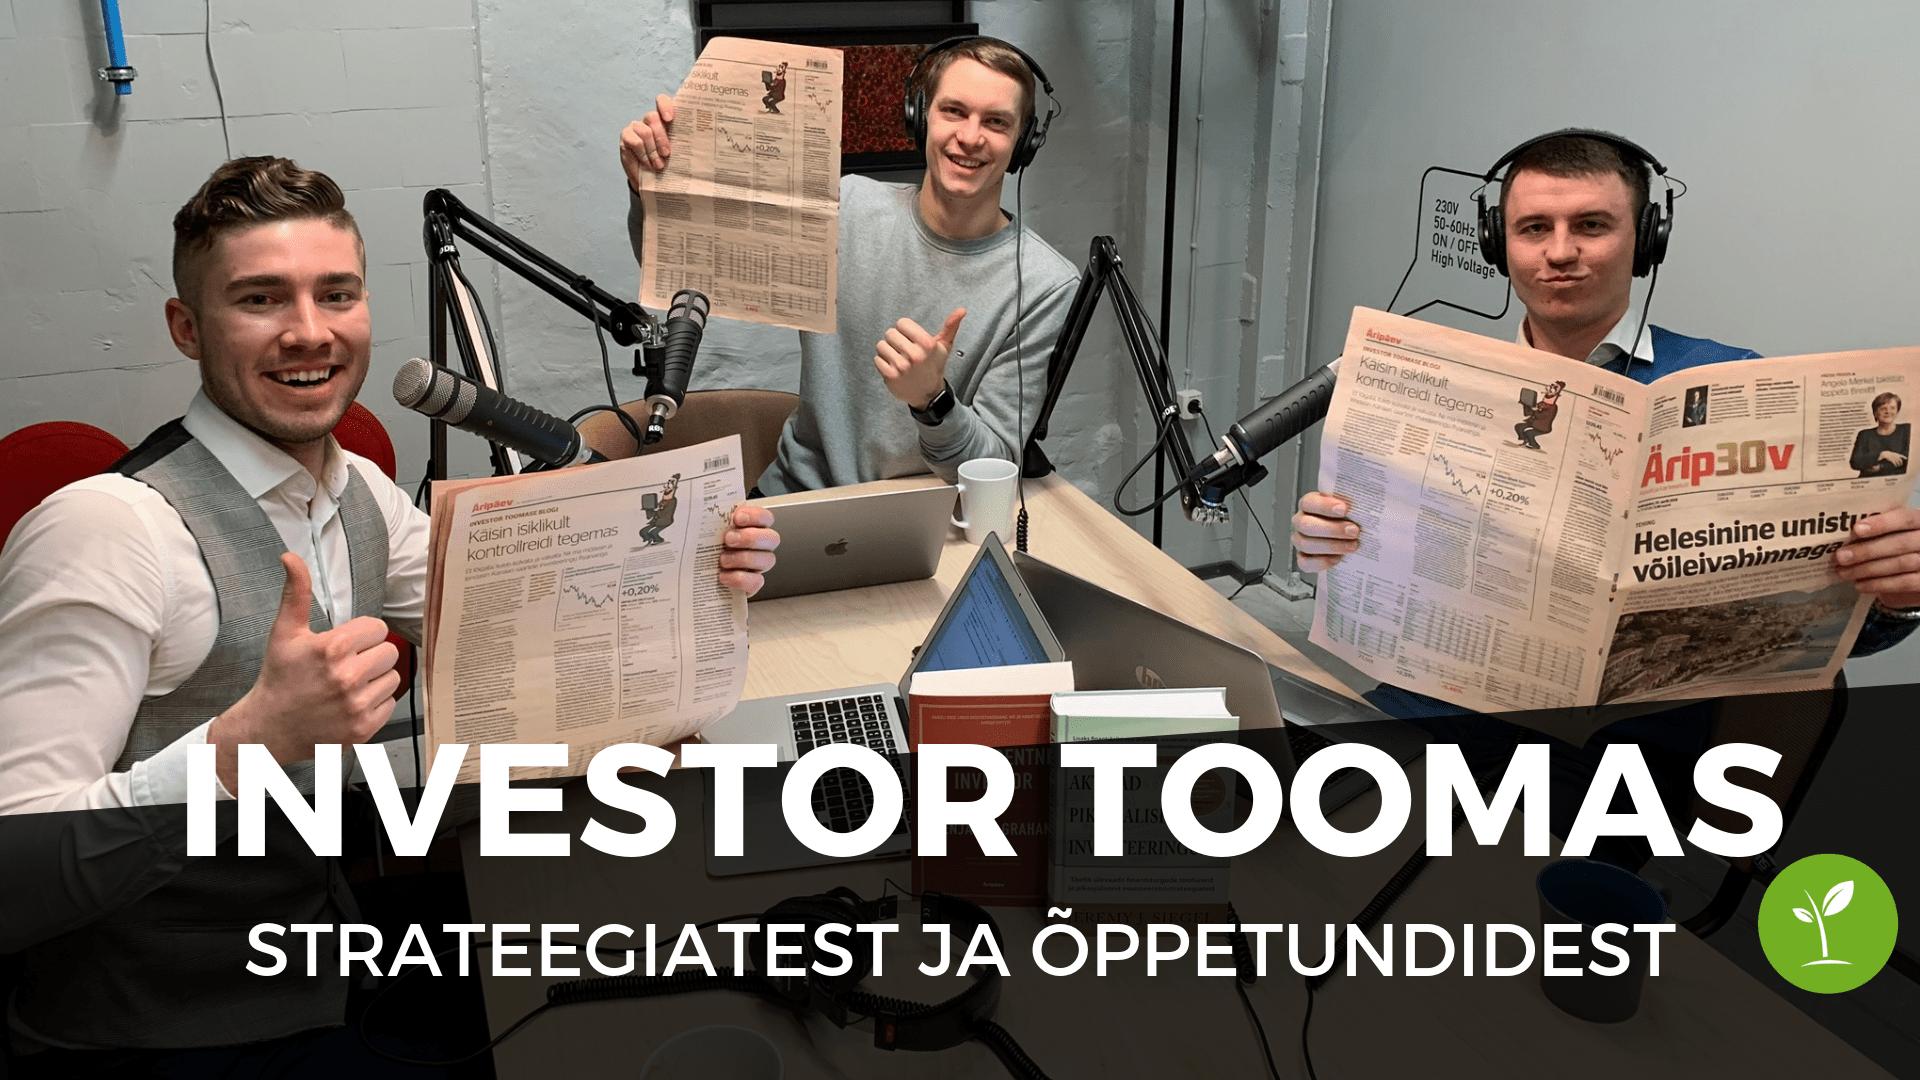 Investor Toomas